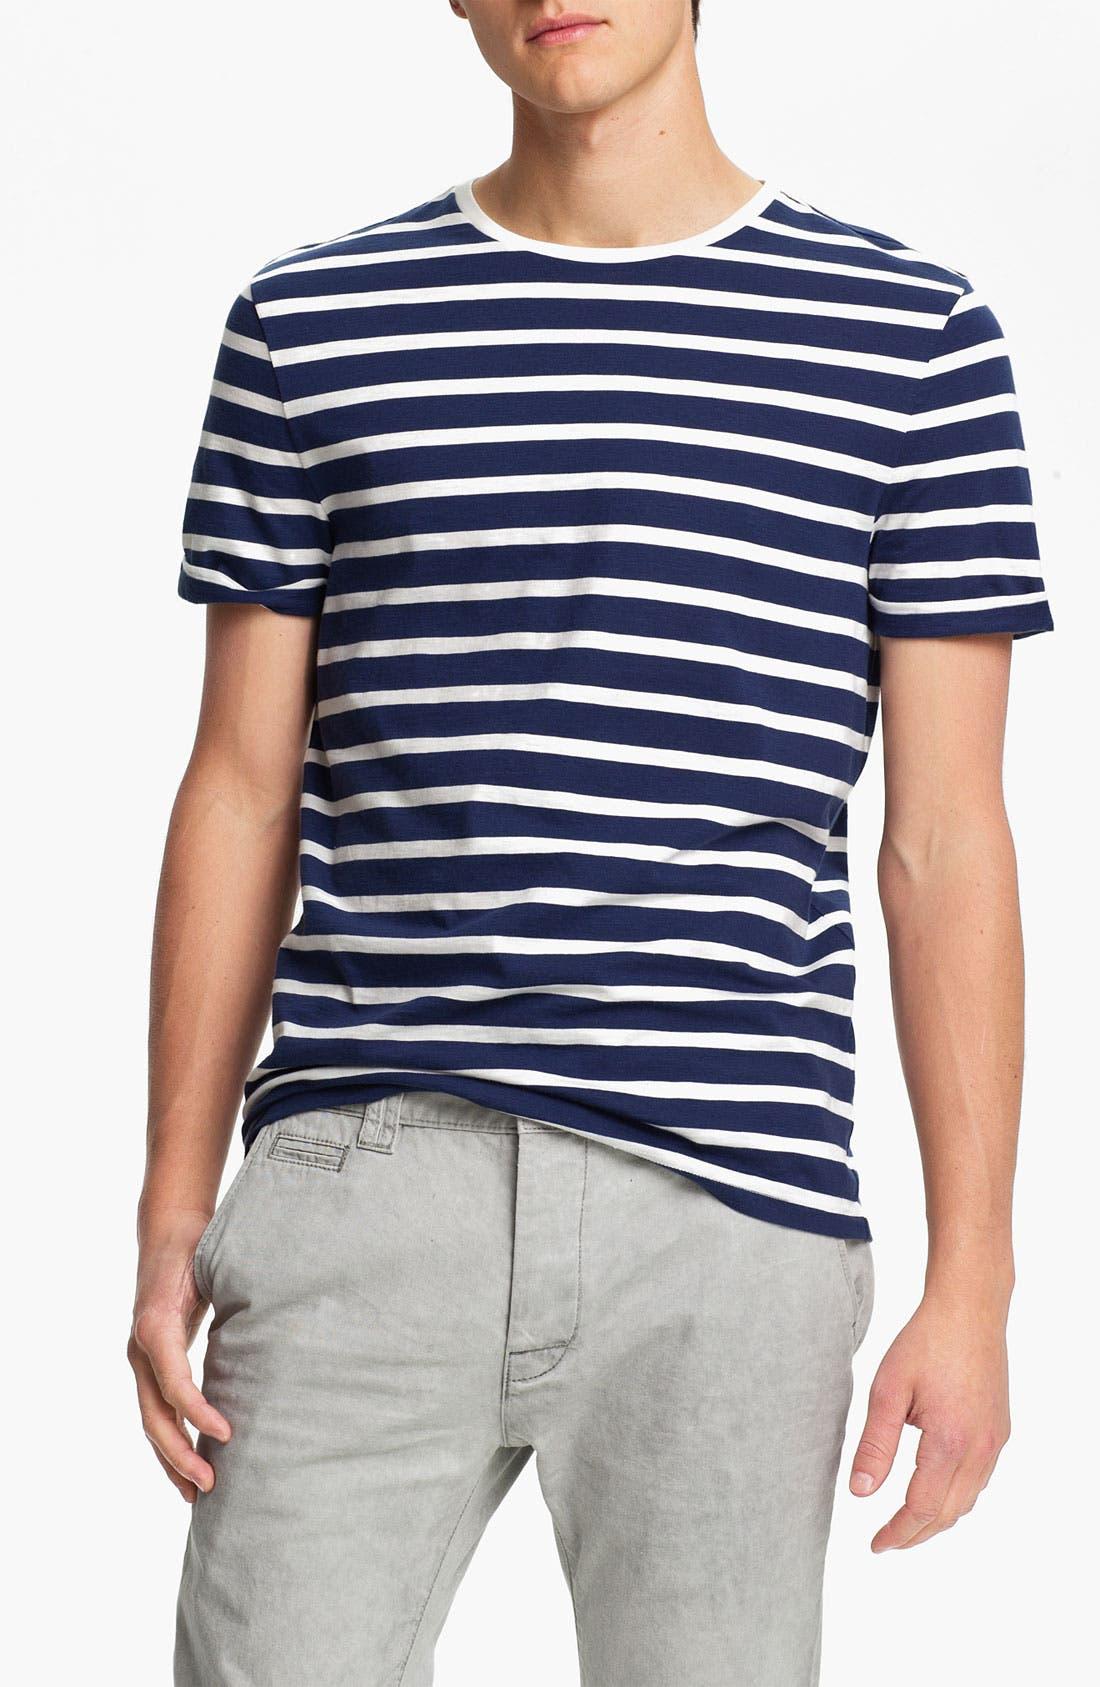 Alternate Image 1 Selected - Topman 'High Roller' Sailor Stripe T-Shirt